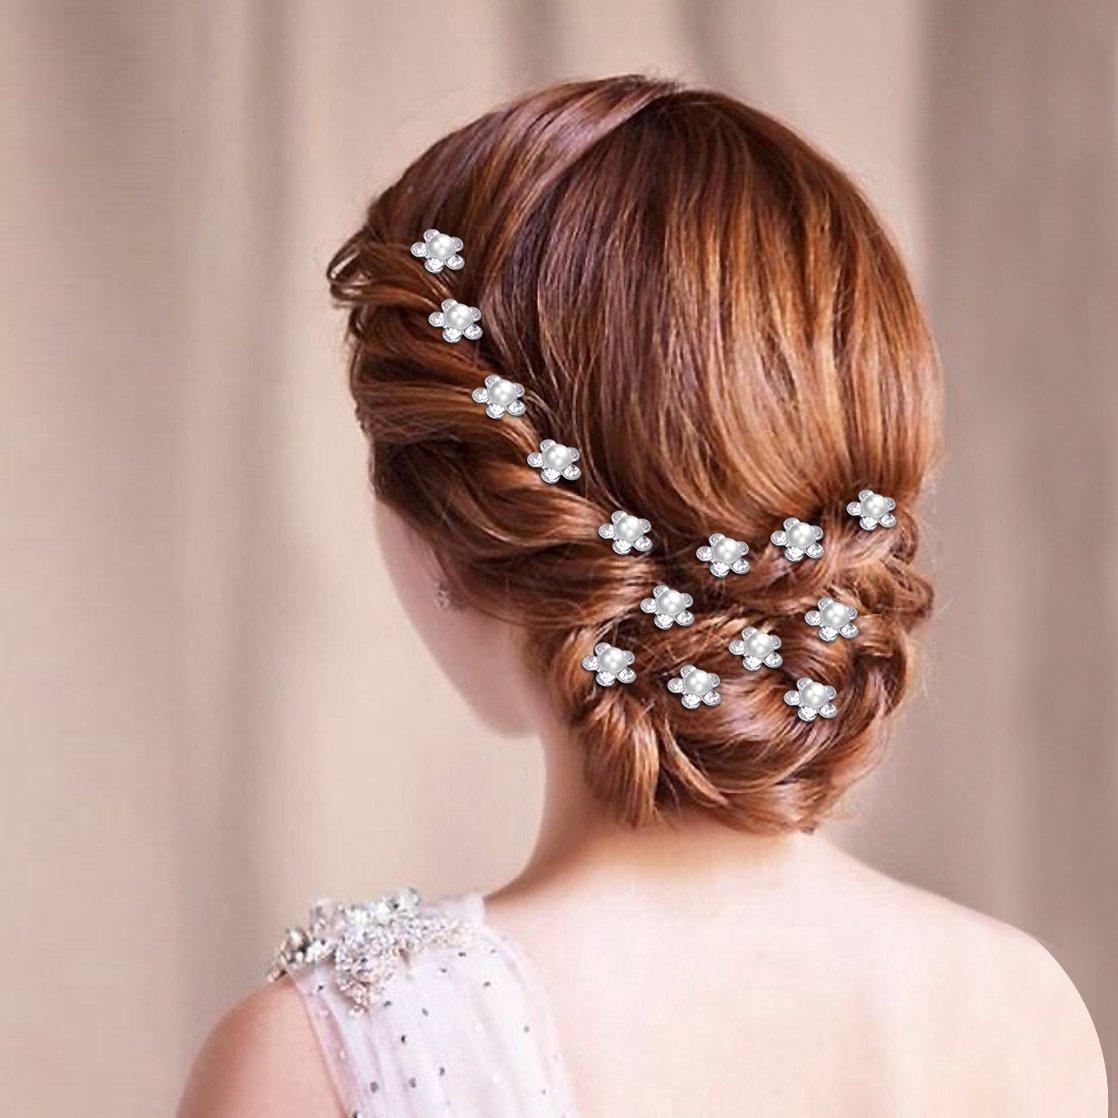 Hair accessories for wedding online india - Amazon Com Dxhycc 20pcs Bridal Hair Pins Pearl Flower Crystal Wedding Hair Clips Hair Accessories Beauty